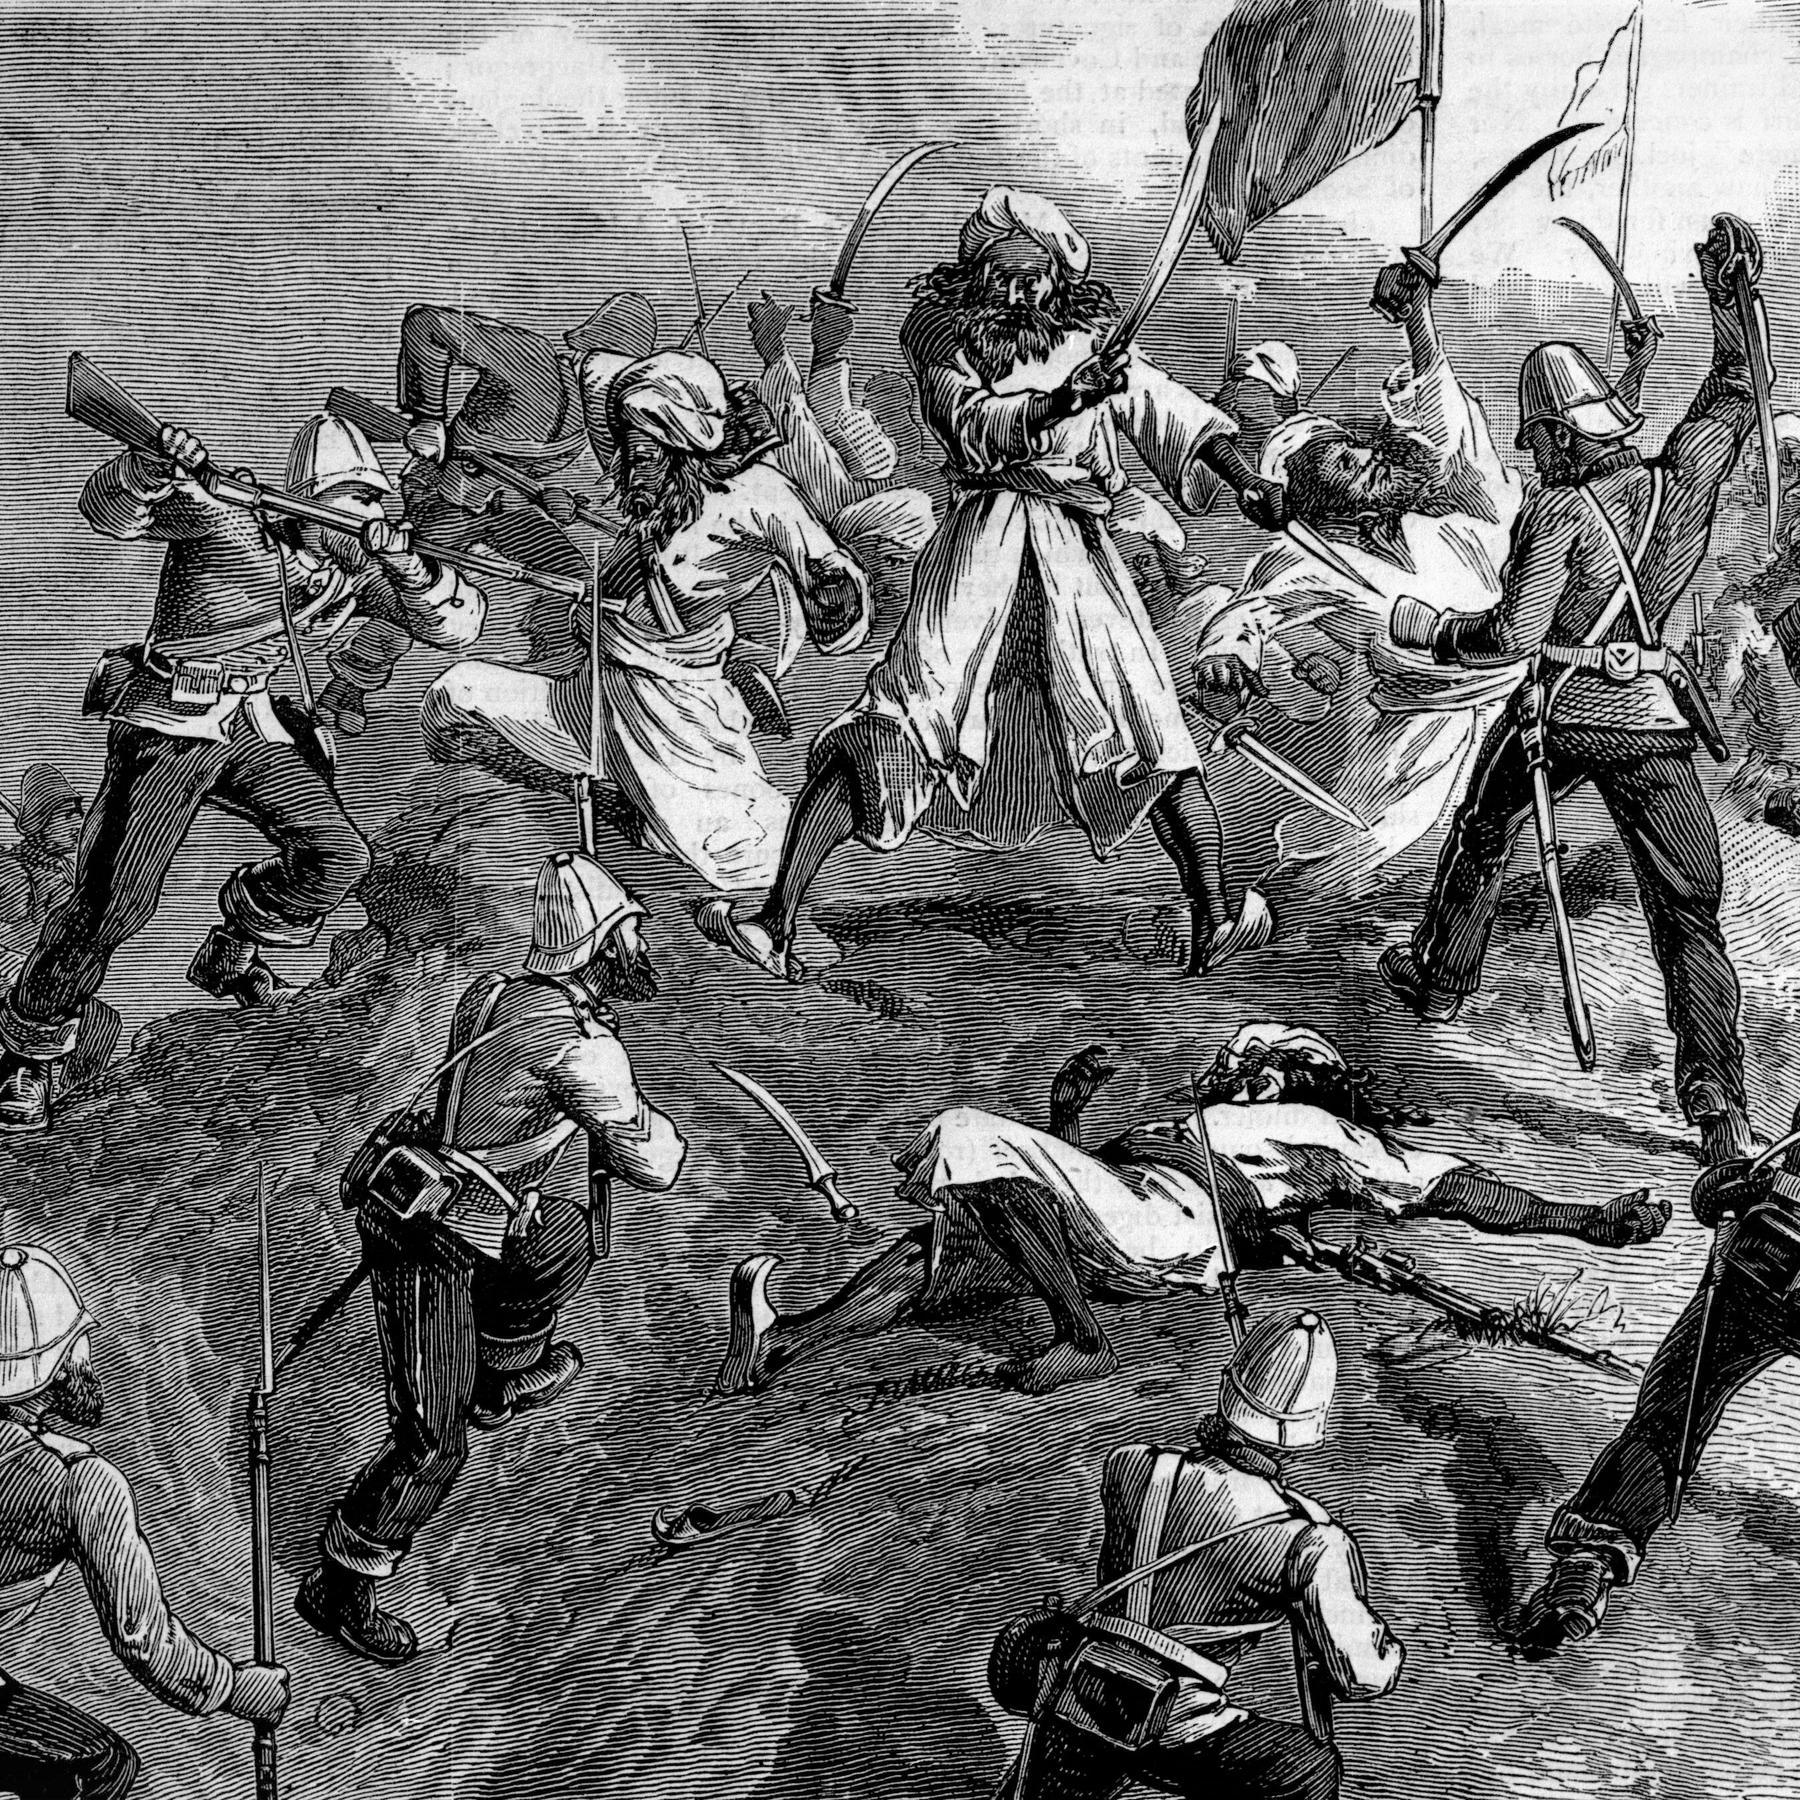 Der Kampf um Zentralasien - The Great Game